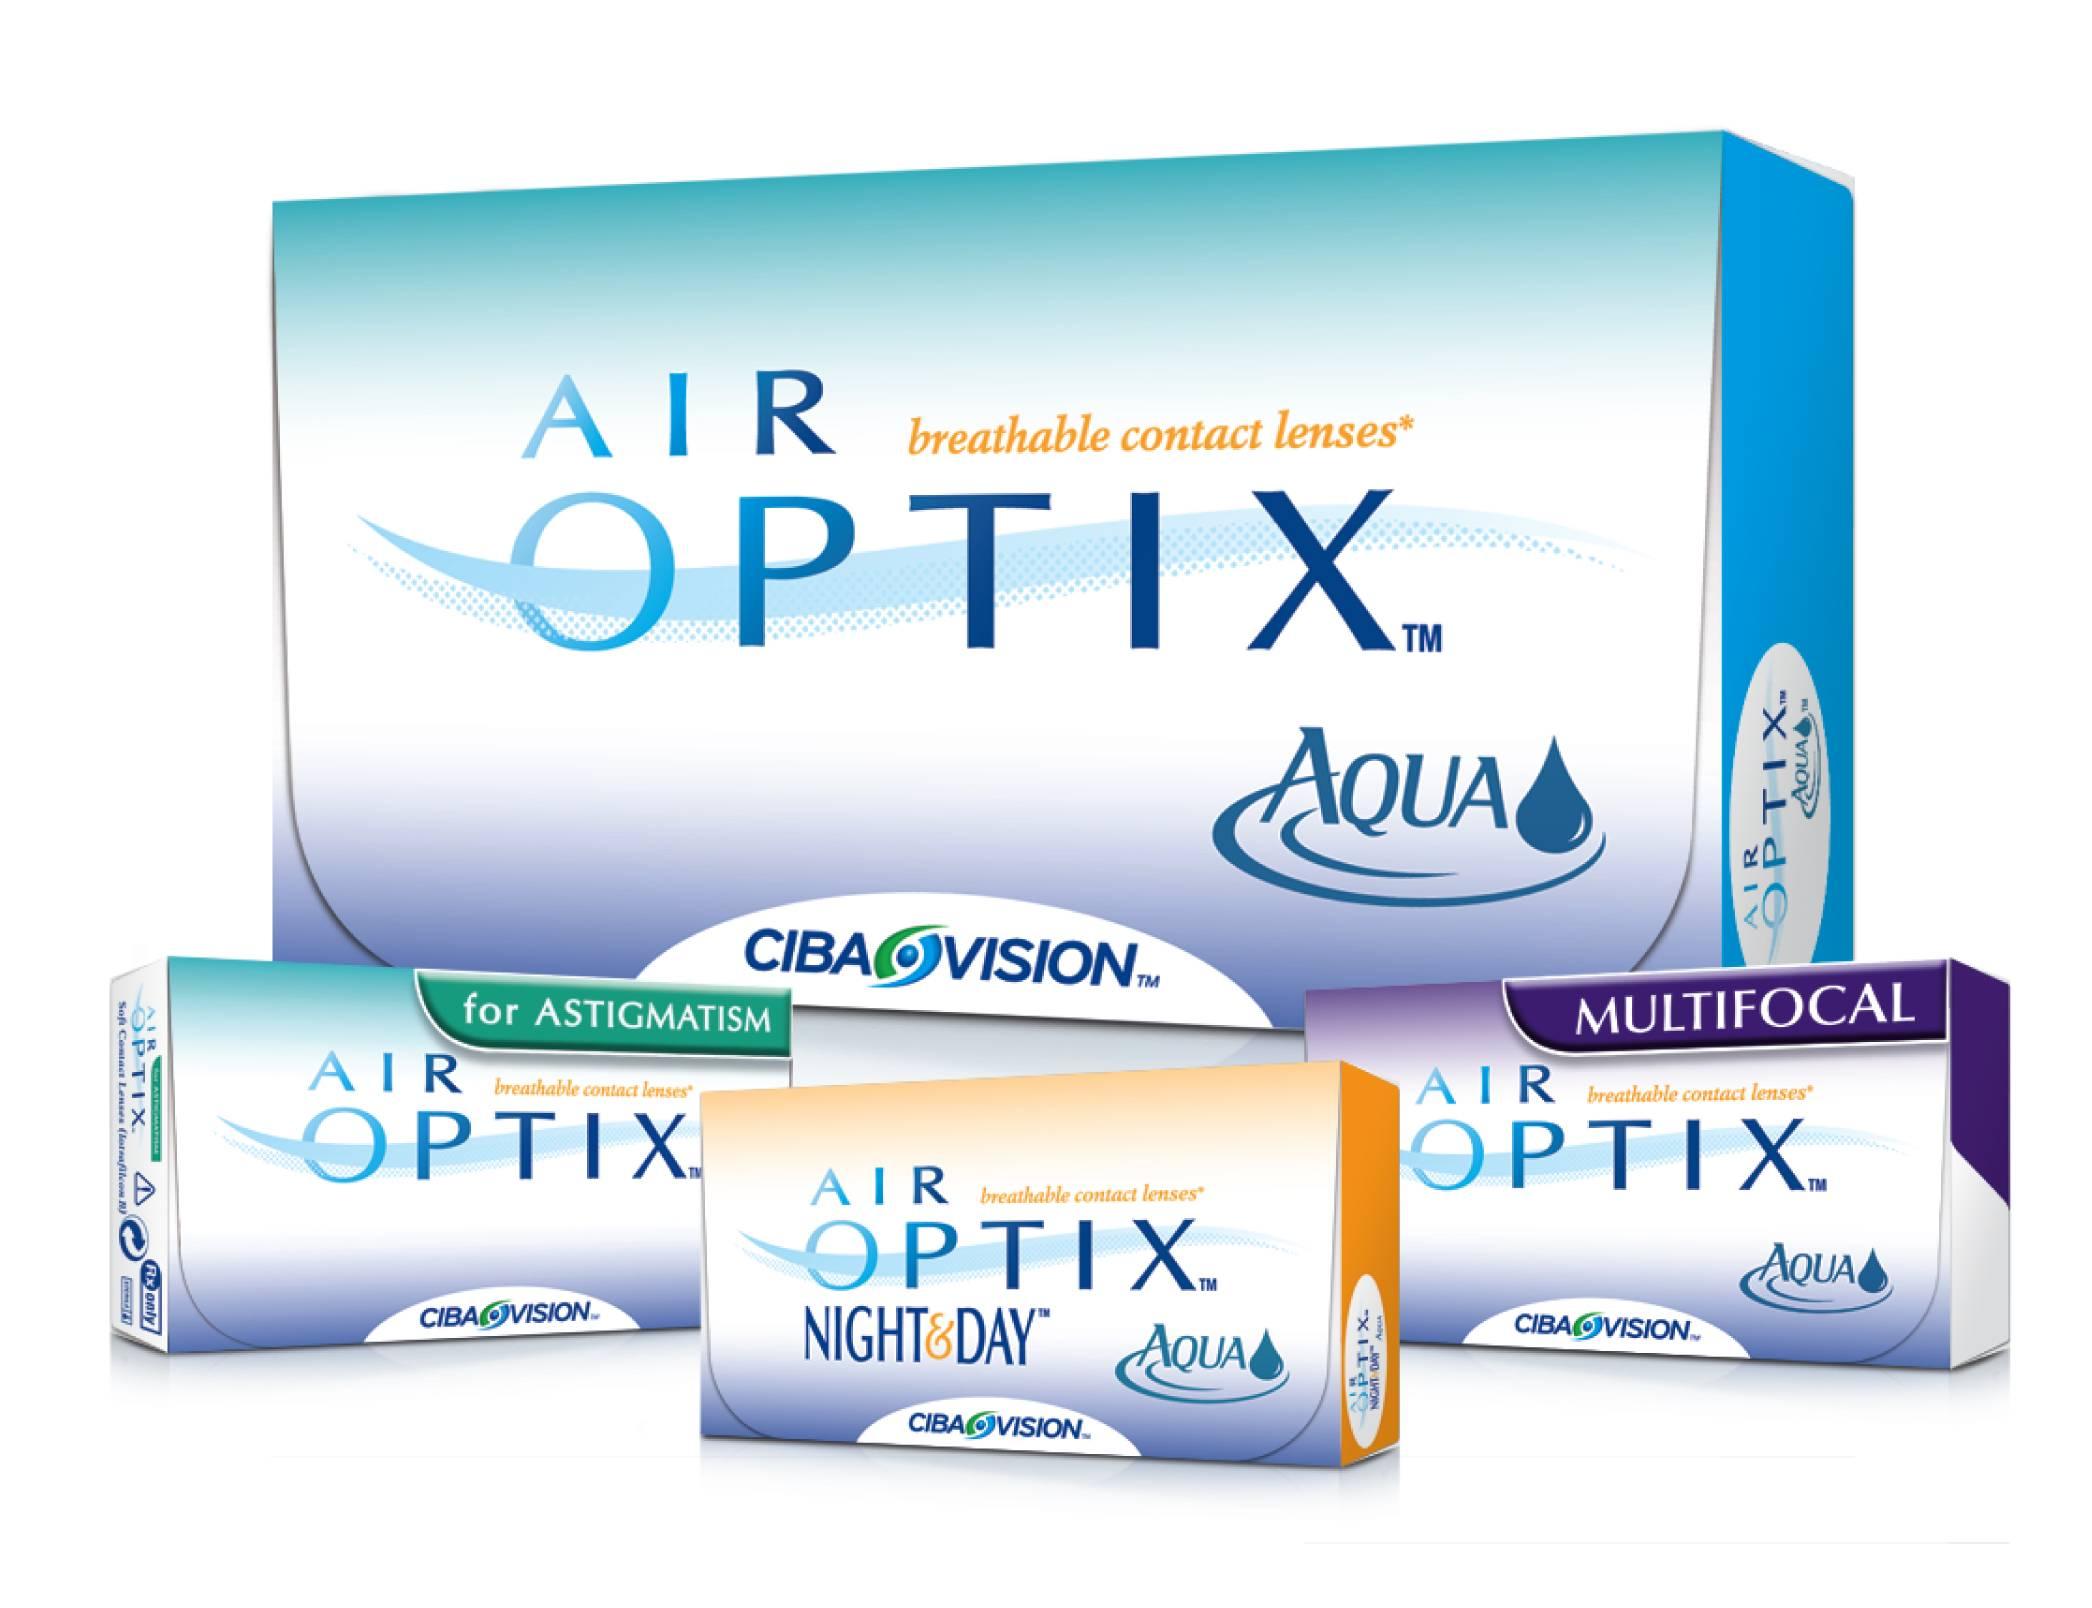 AirOptix contact lenses from optometrist leesburg GA